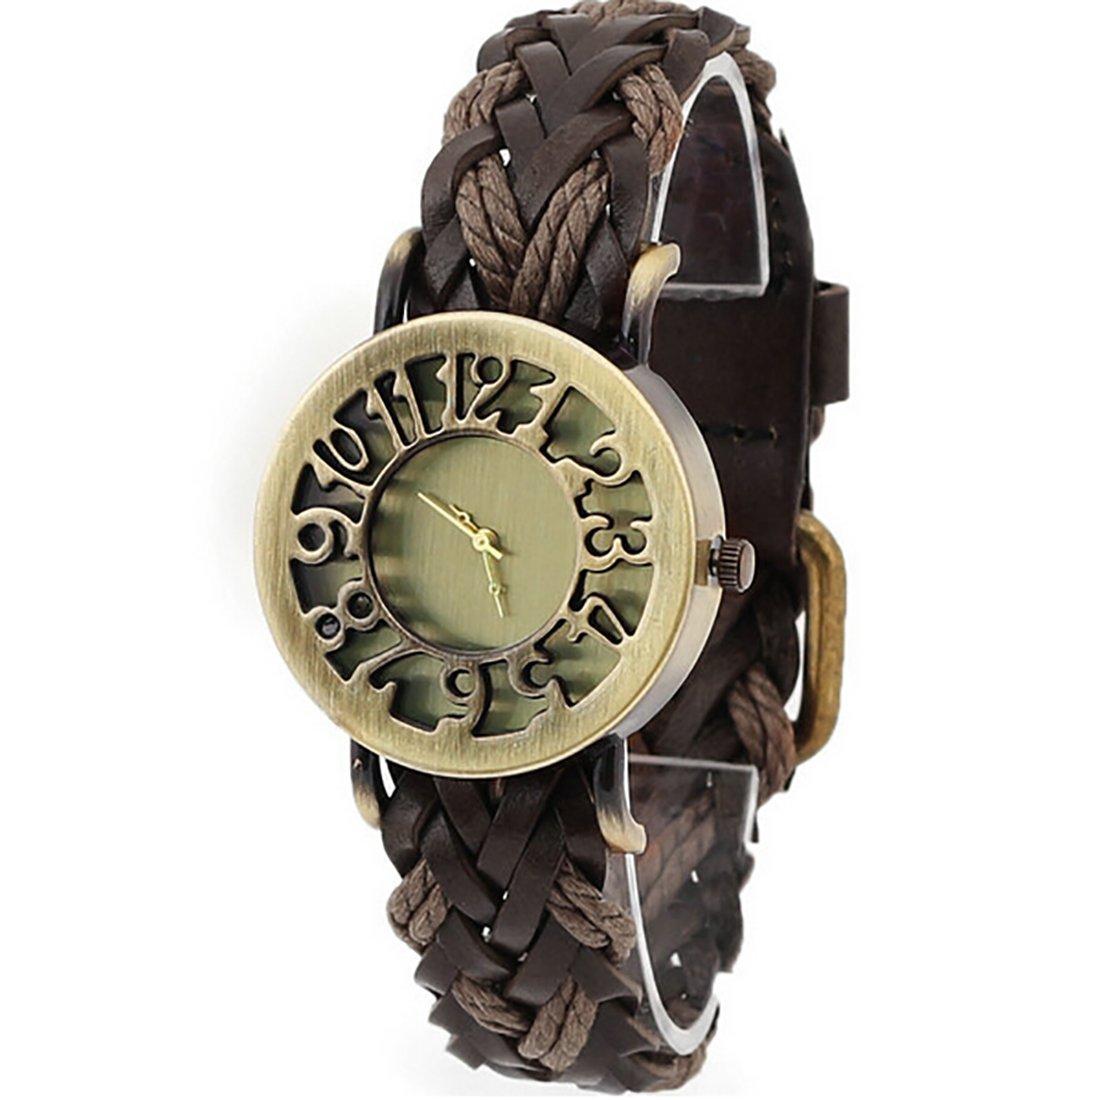 Amazon.com: 2016 Women Braided Leather Hollow Skeleton Dress Watches Quartz Watches Retro Vintage Bracelet Wristwatch Relogio Feminino Brown: Watches